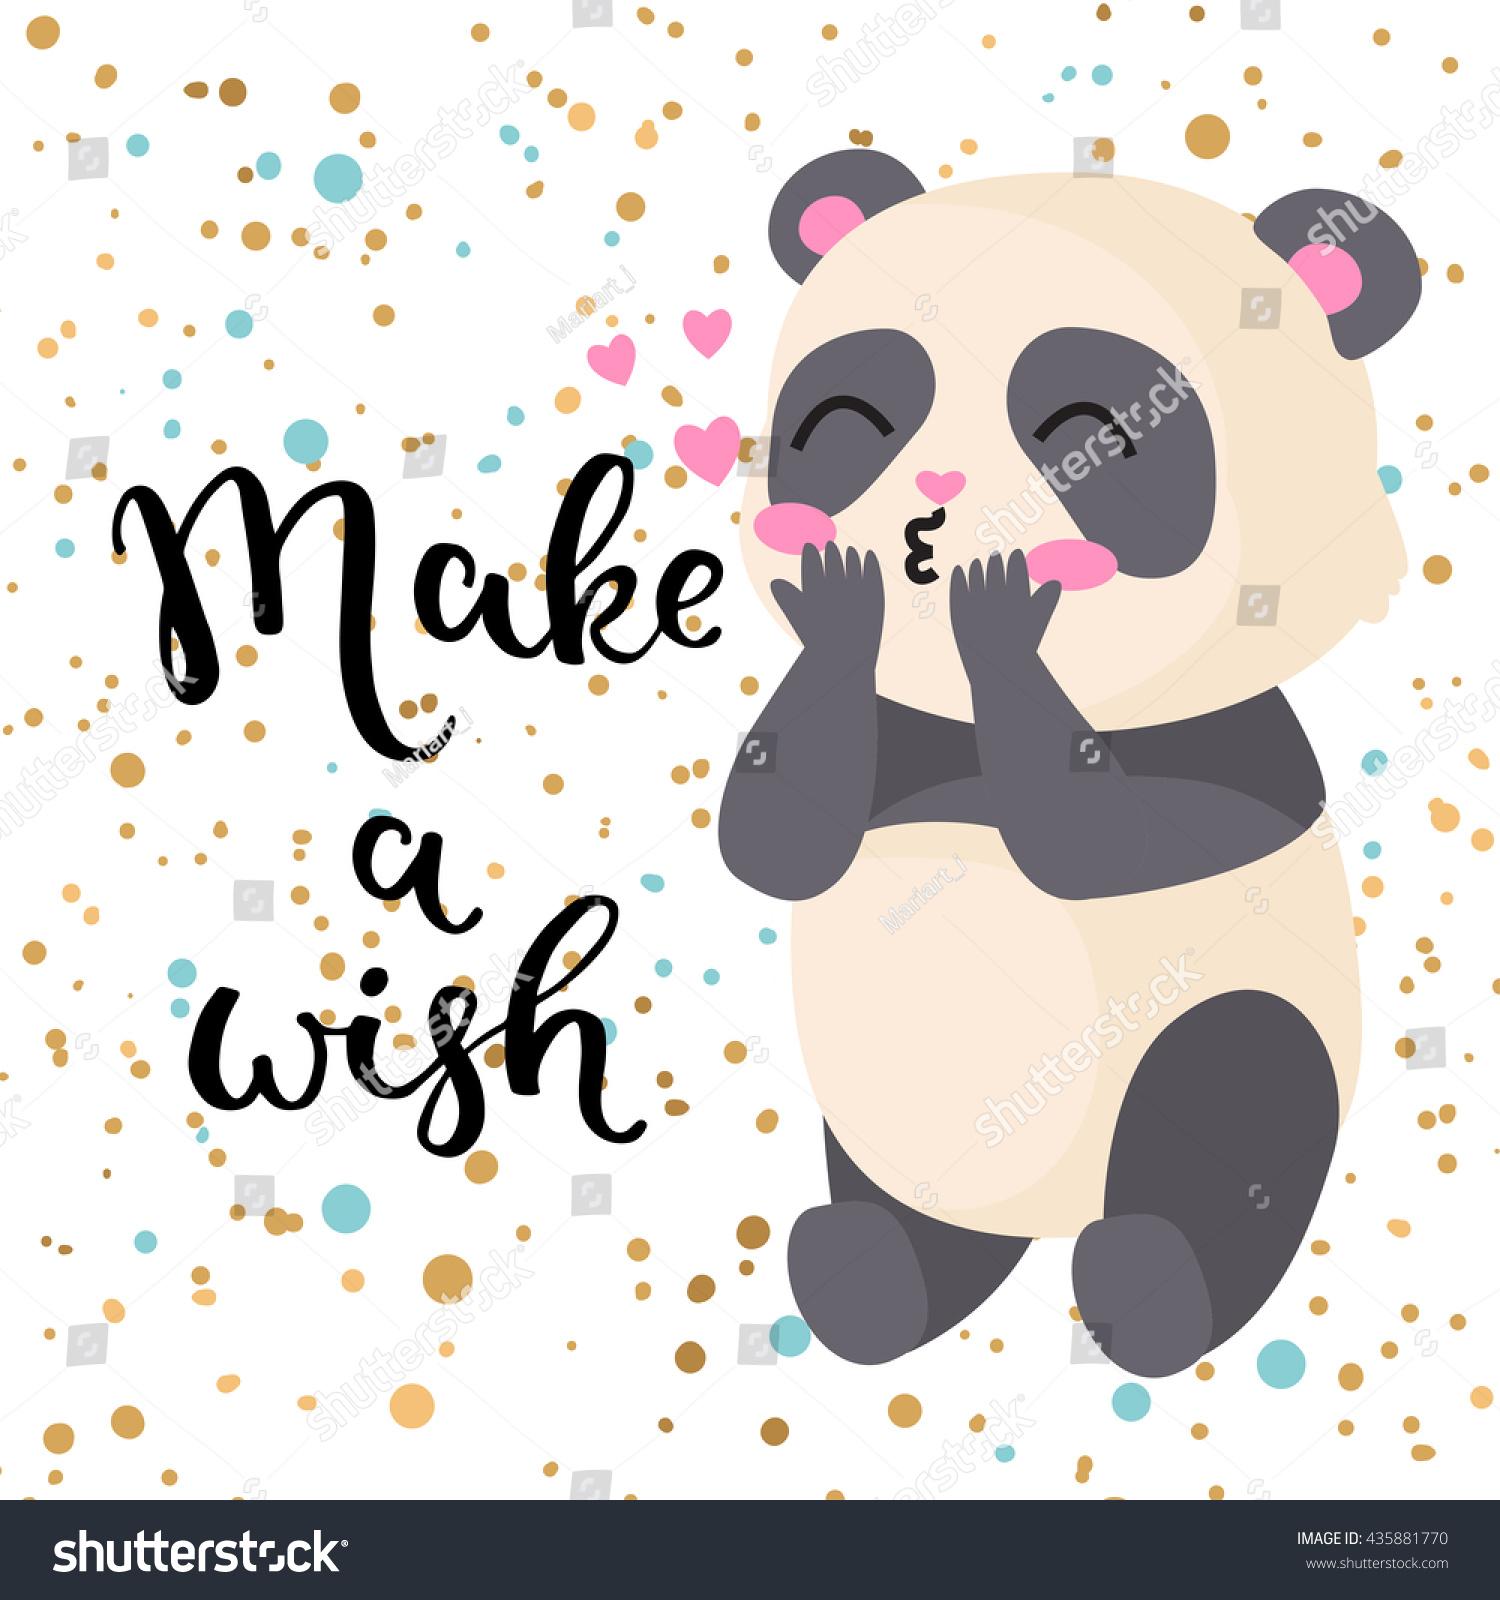 Panda Quotes Panda Funny Birthday Quotes